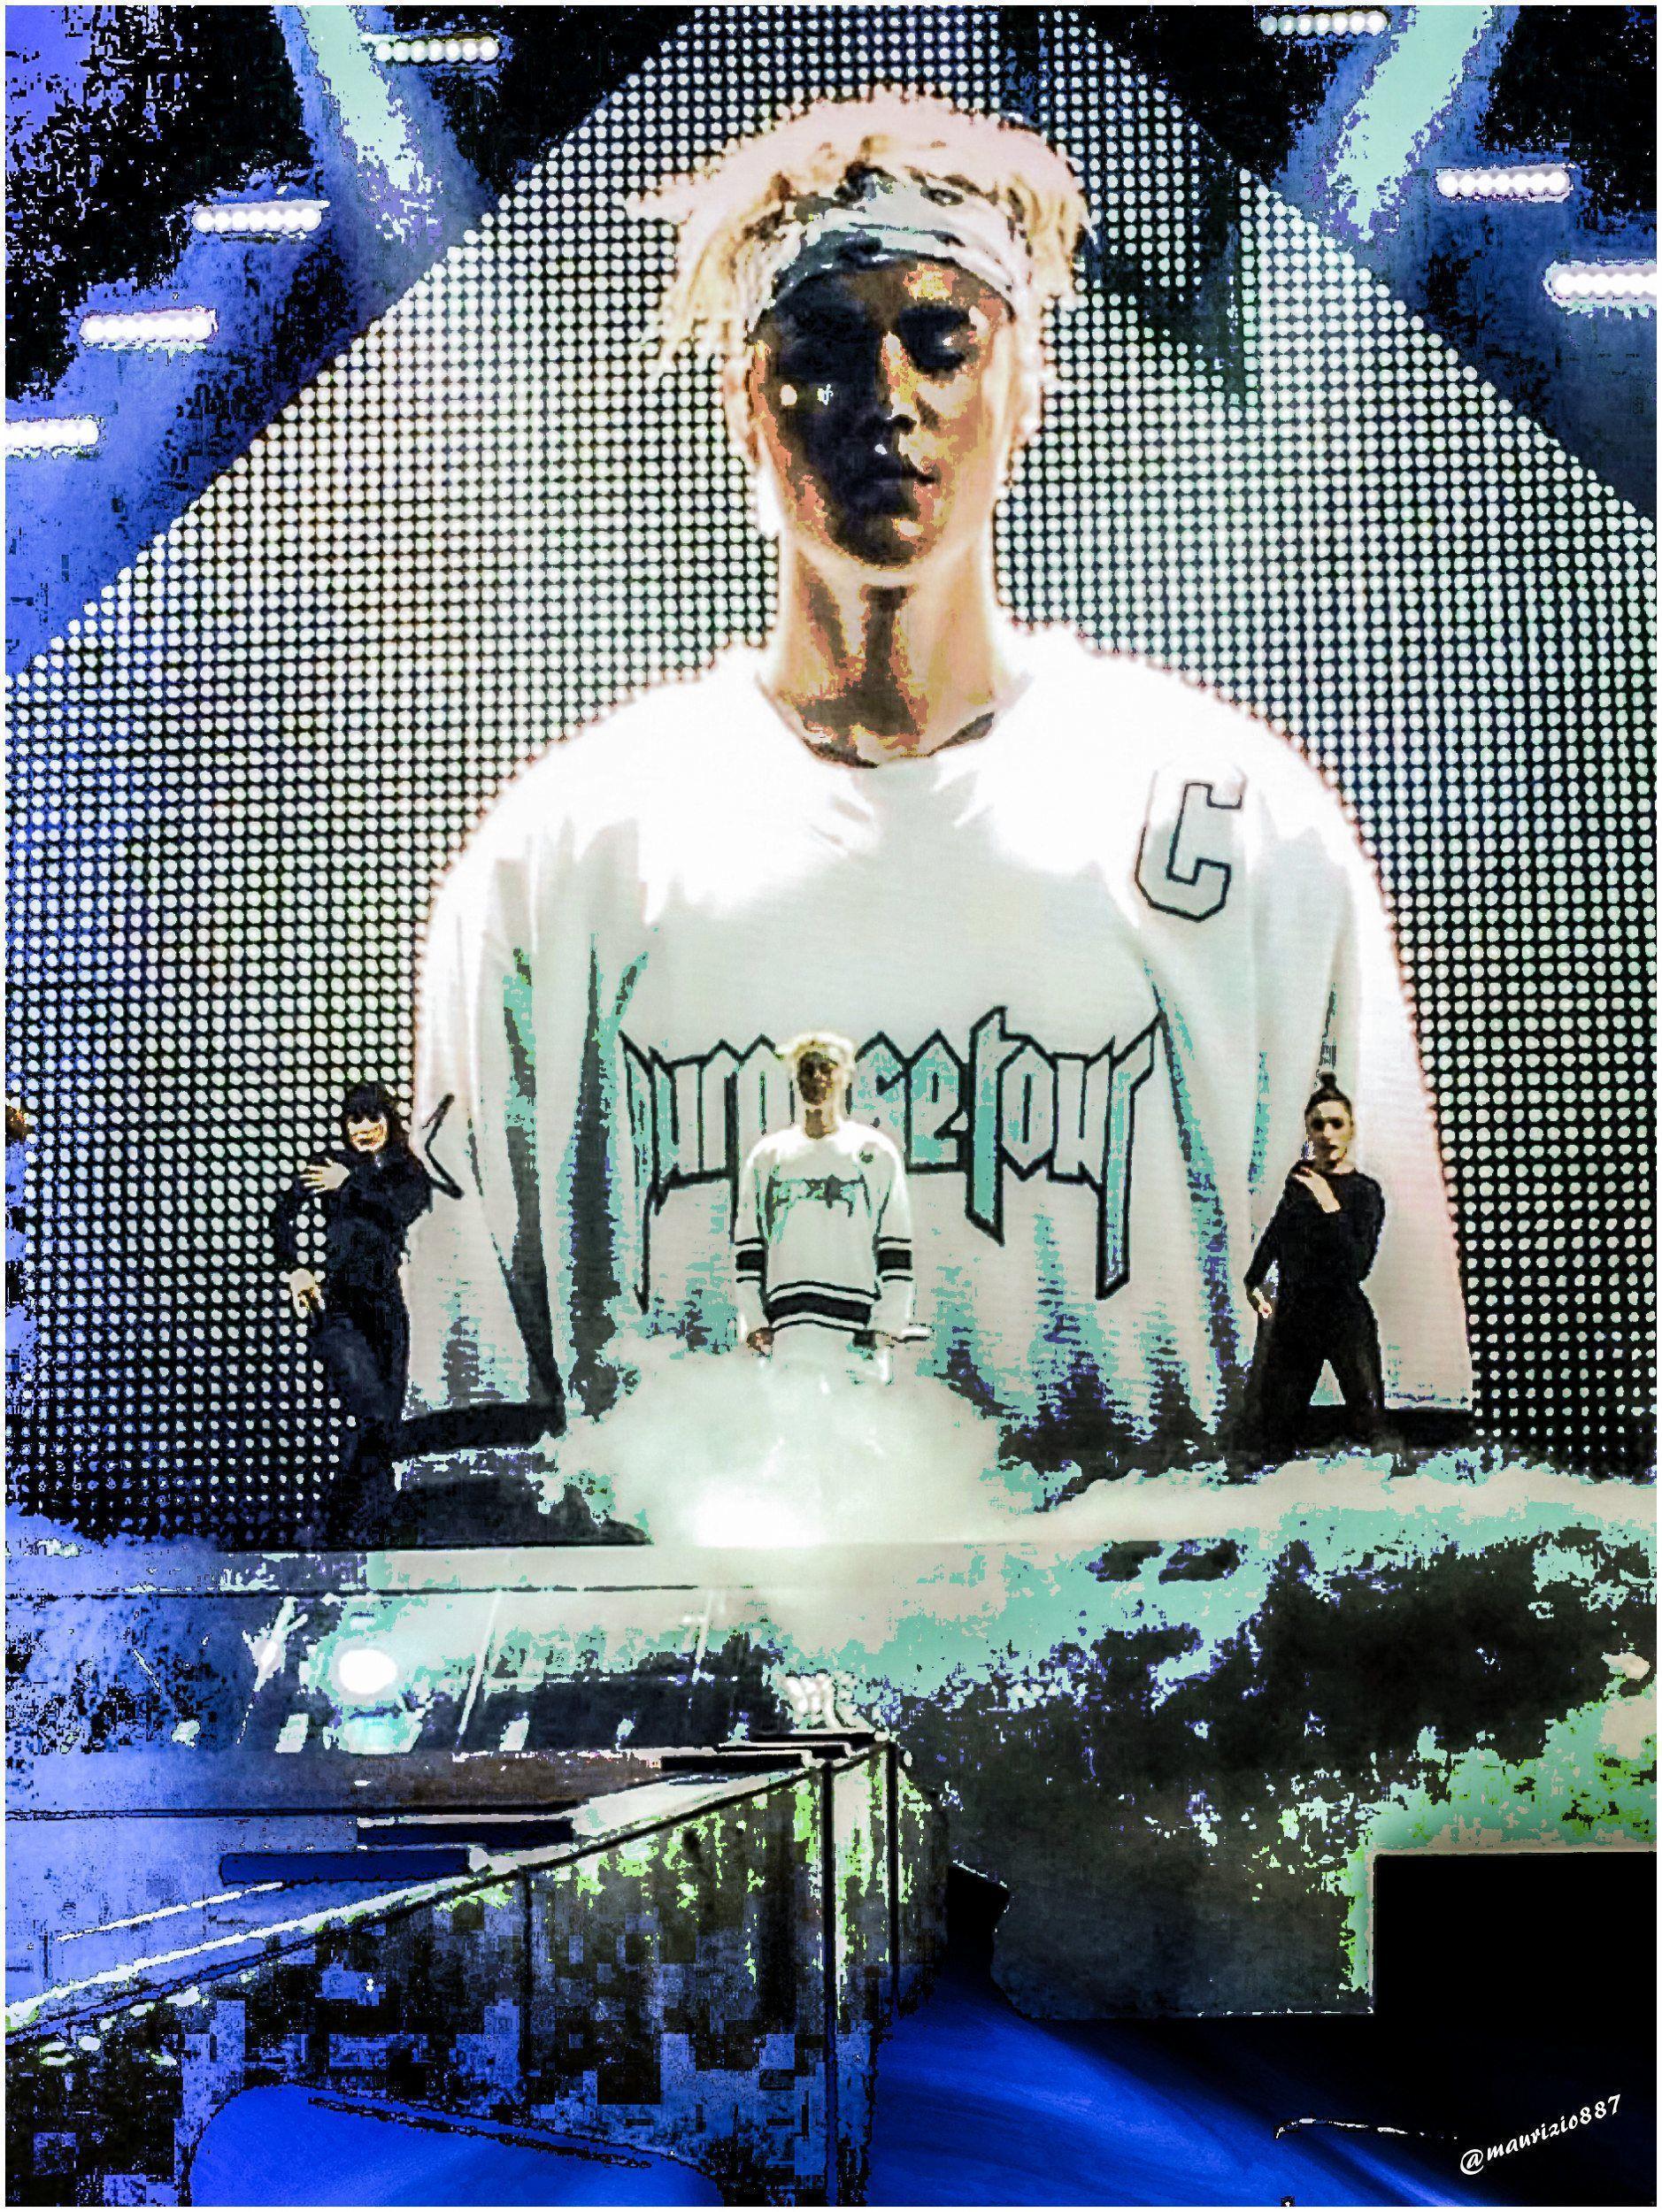 Justin Bieber 2018 Wallpapers Wallpaper Cave